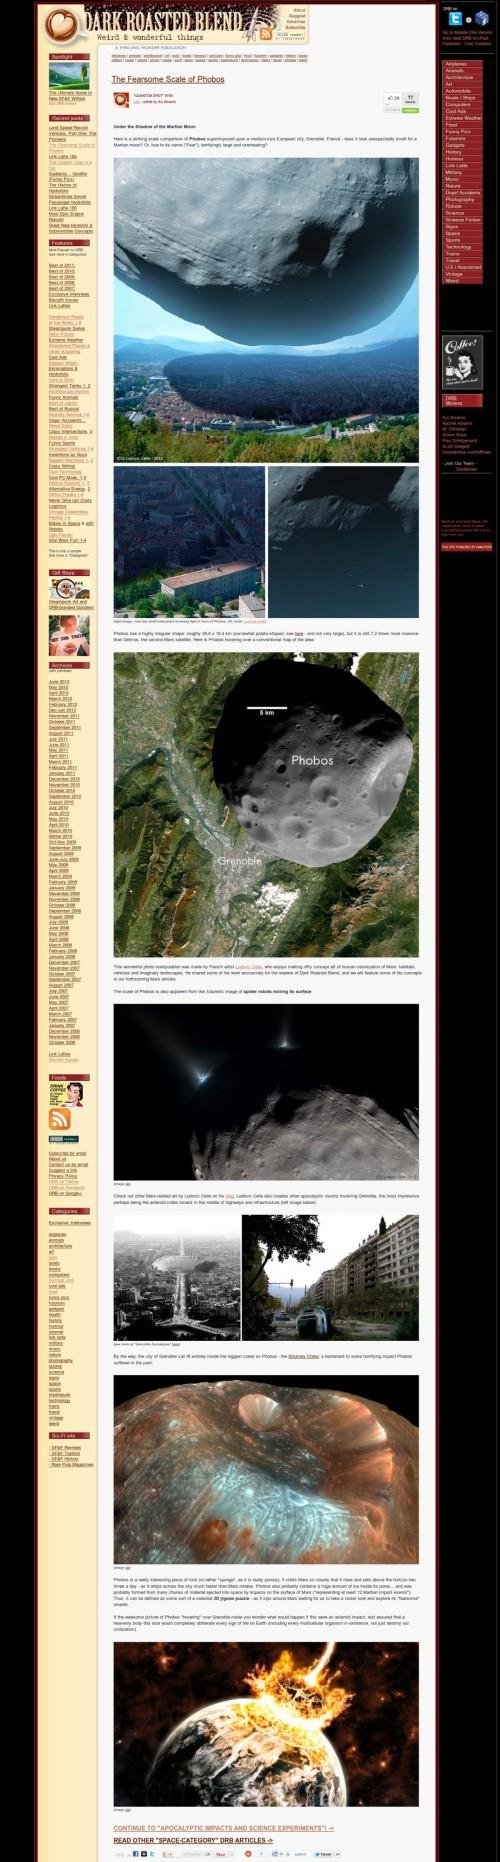 Presse-2012-DarkRoastedBlend-scalePhobos-full-article